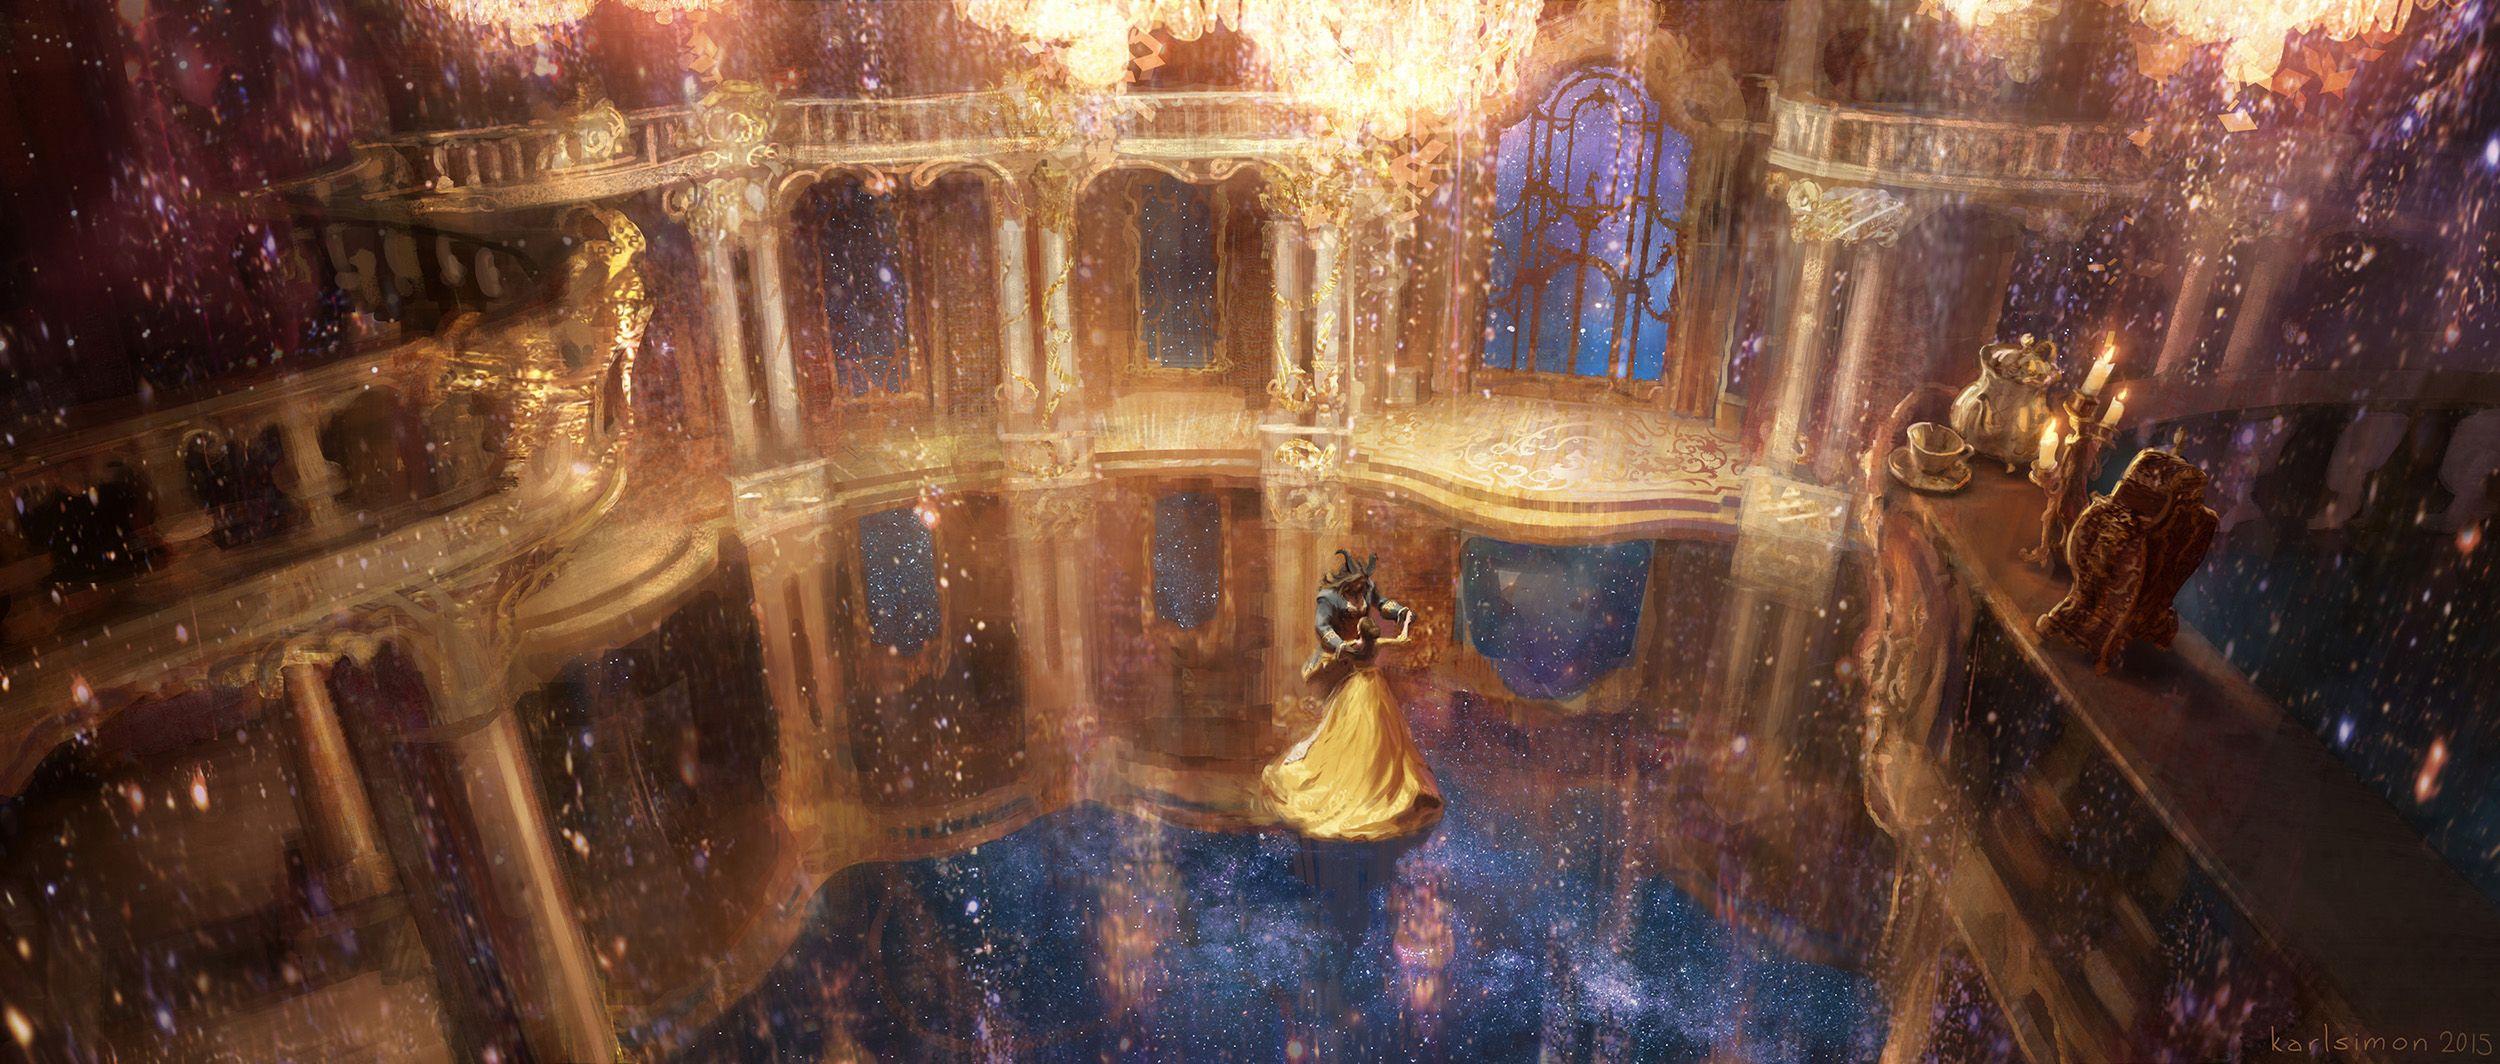 Beauty-and-the-Beast-Concept-Art-Disney-Karlsimon-Ballroom_magic_02_L.jpeg (2500×1064)